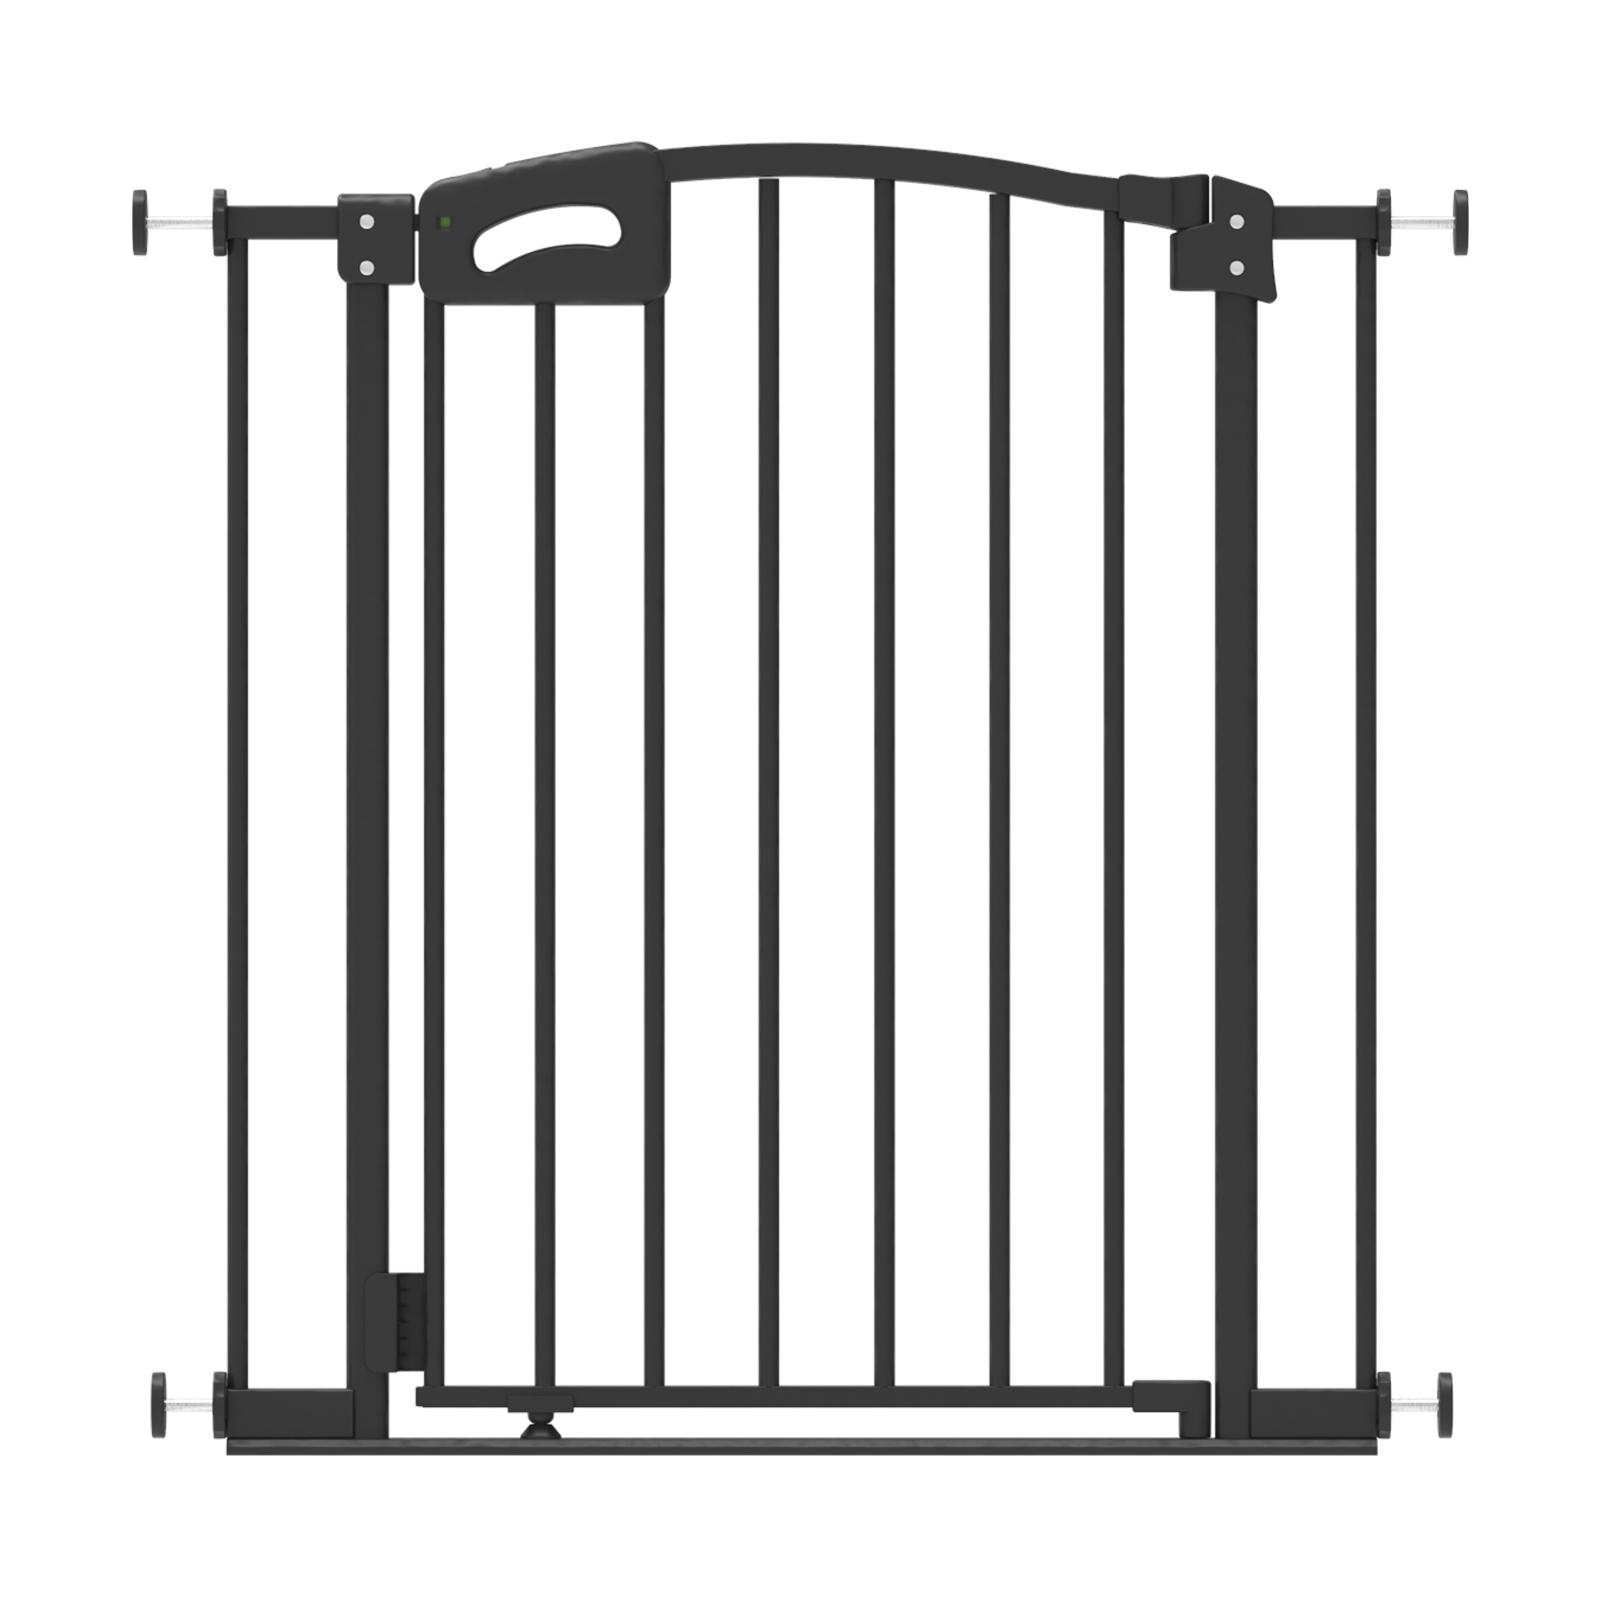 Perma Child Safety Ultimate Safety Gate